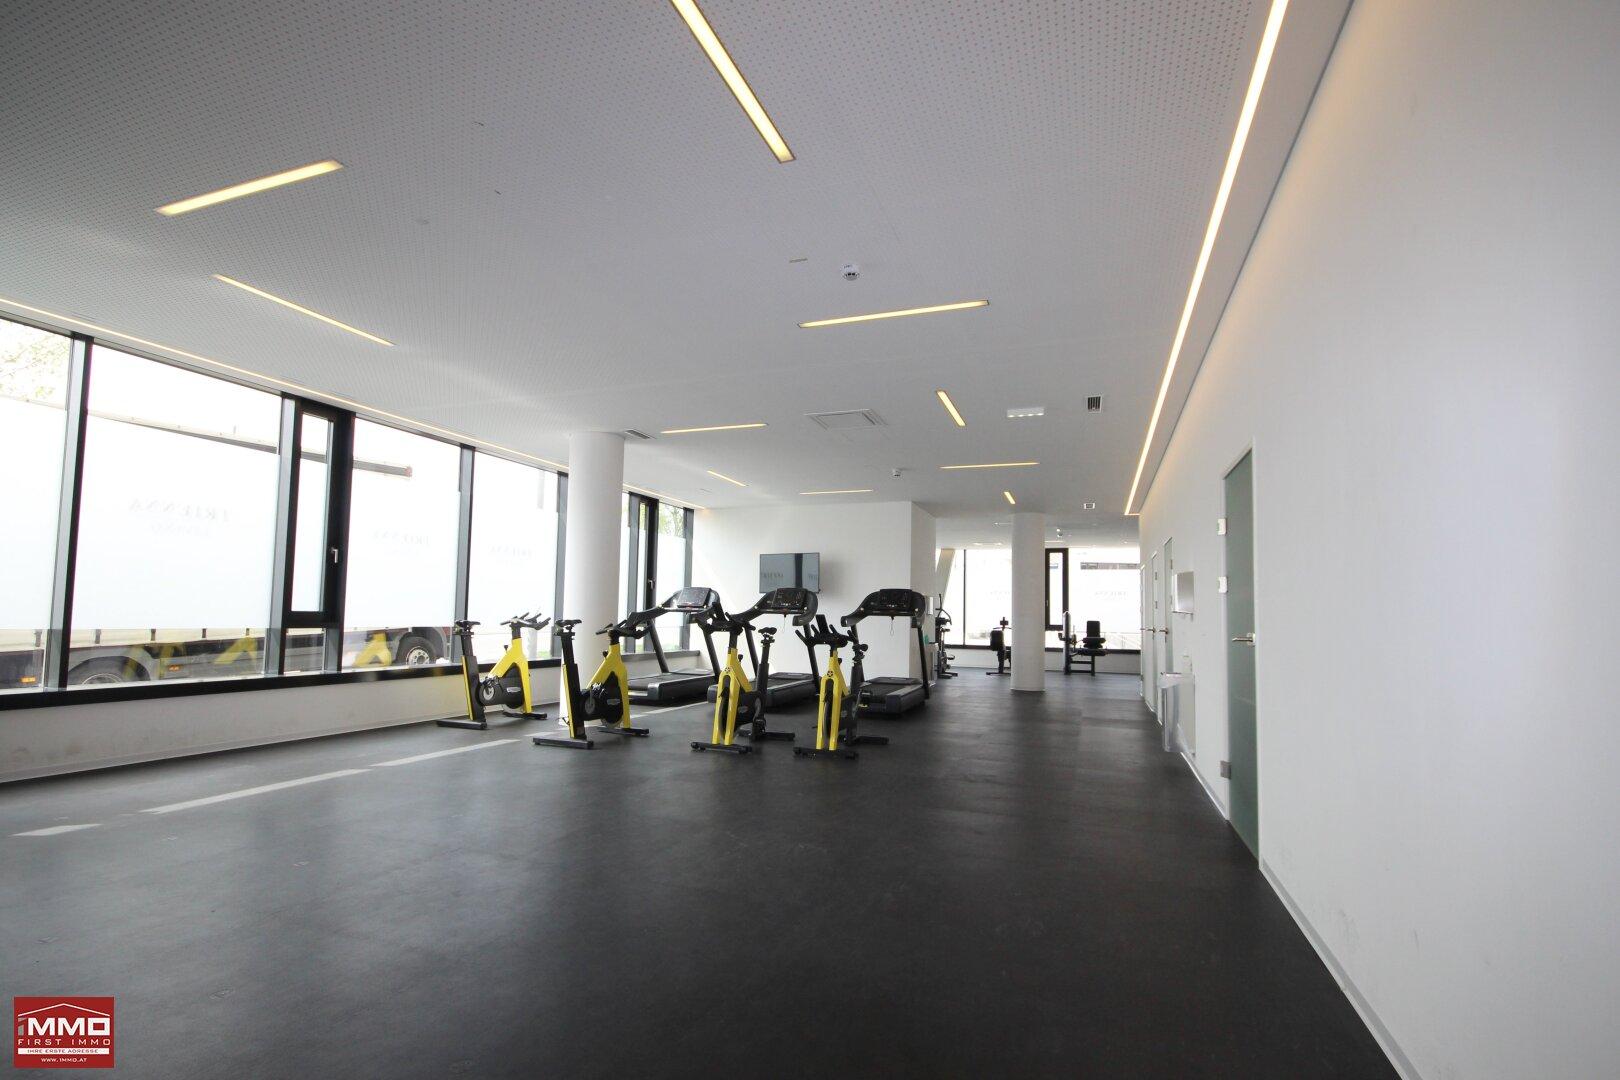 Fitnesscenter Cardiobereich